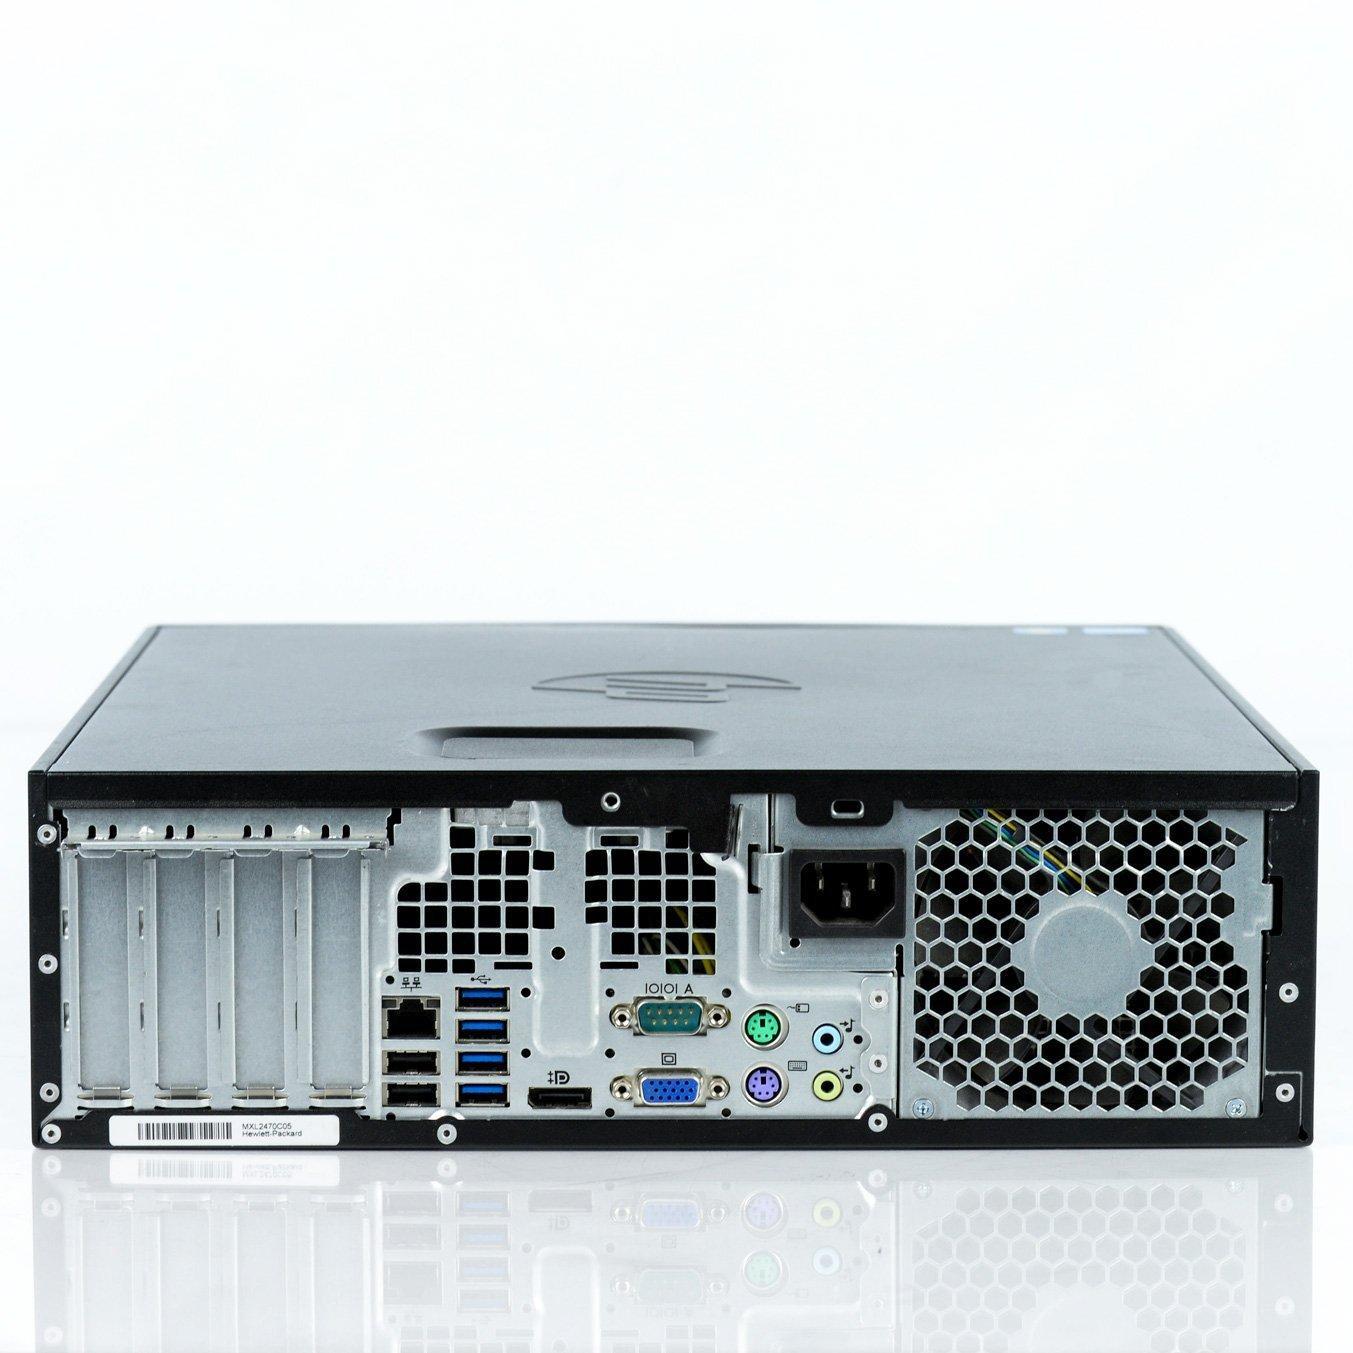 HP Compaq Elite 8300 SFF Pentium G645 2,9 - HDD 250 Gb - 4GB